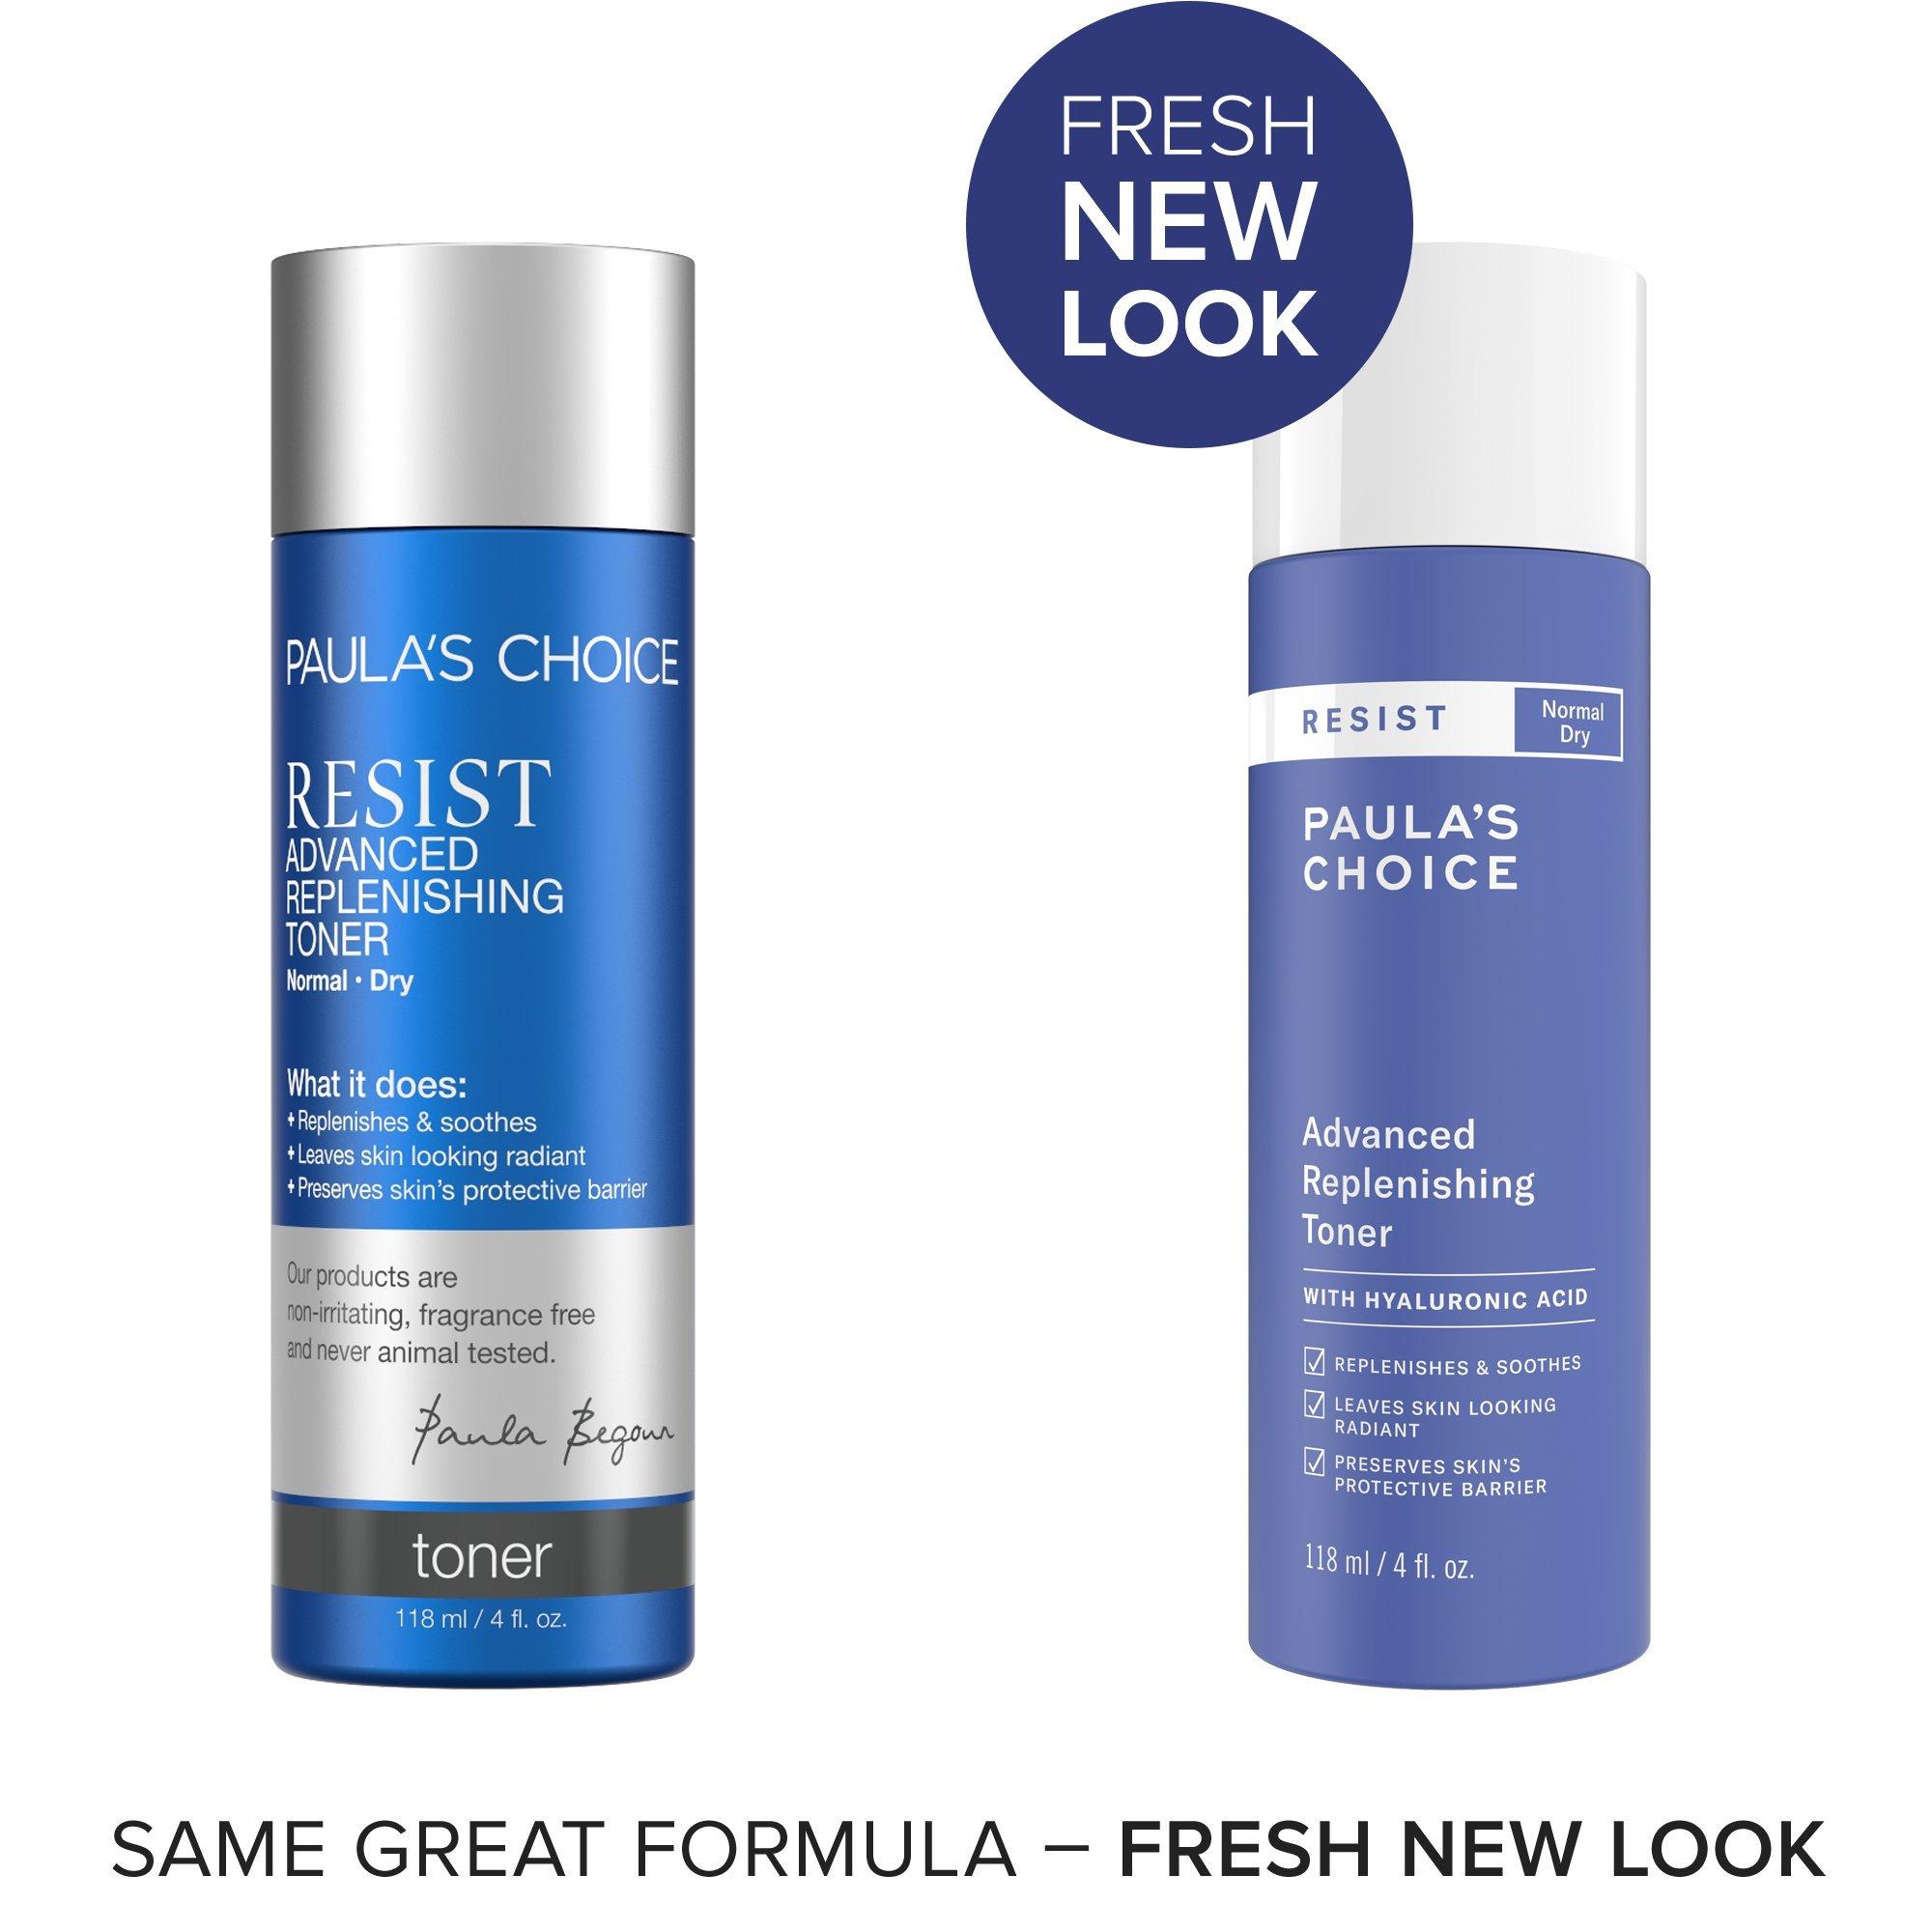 Paula's Choice-RESIST Advanced Replenishing Anti-Aging Toner w/Vitamins C & E & Antioxidants-Face Toner-Normal-Very Dry Skin-4oz Bottle